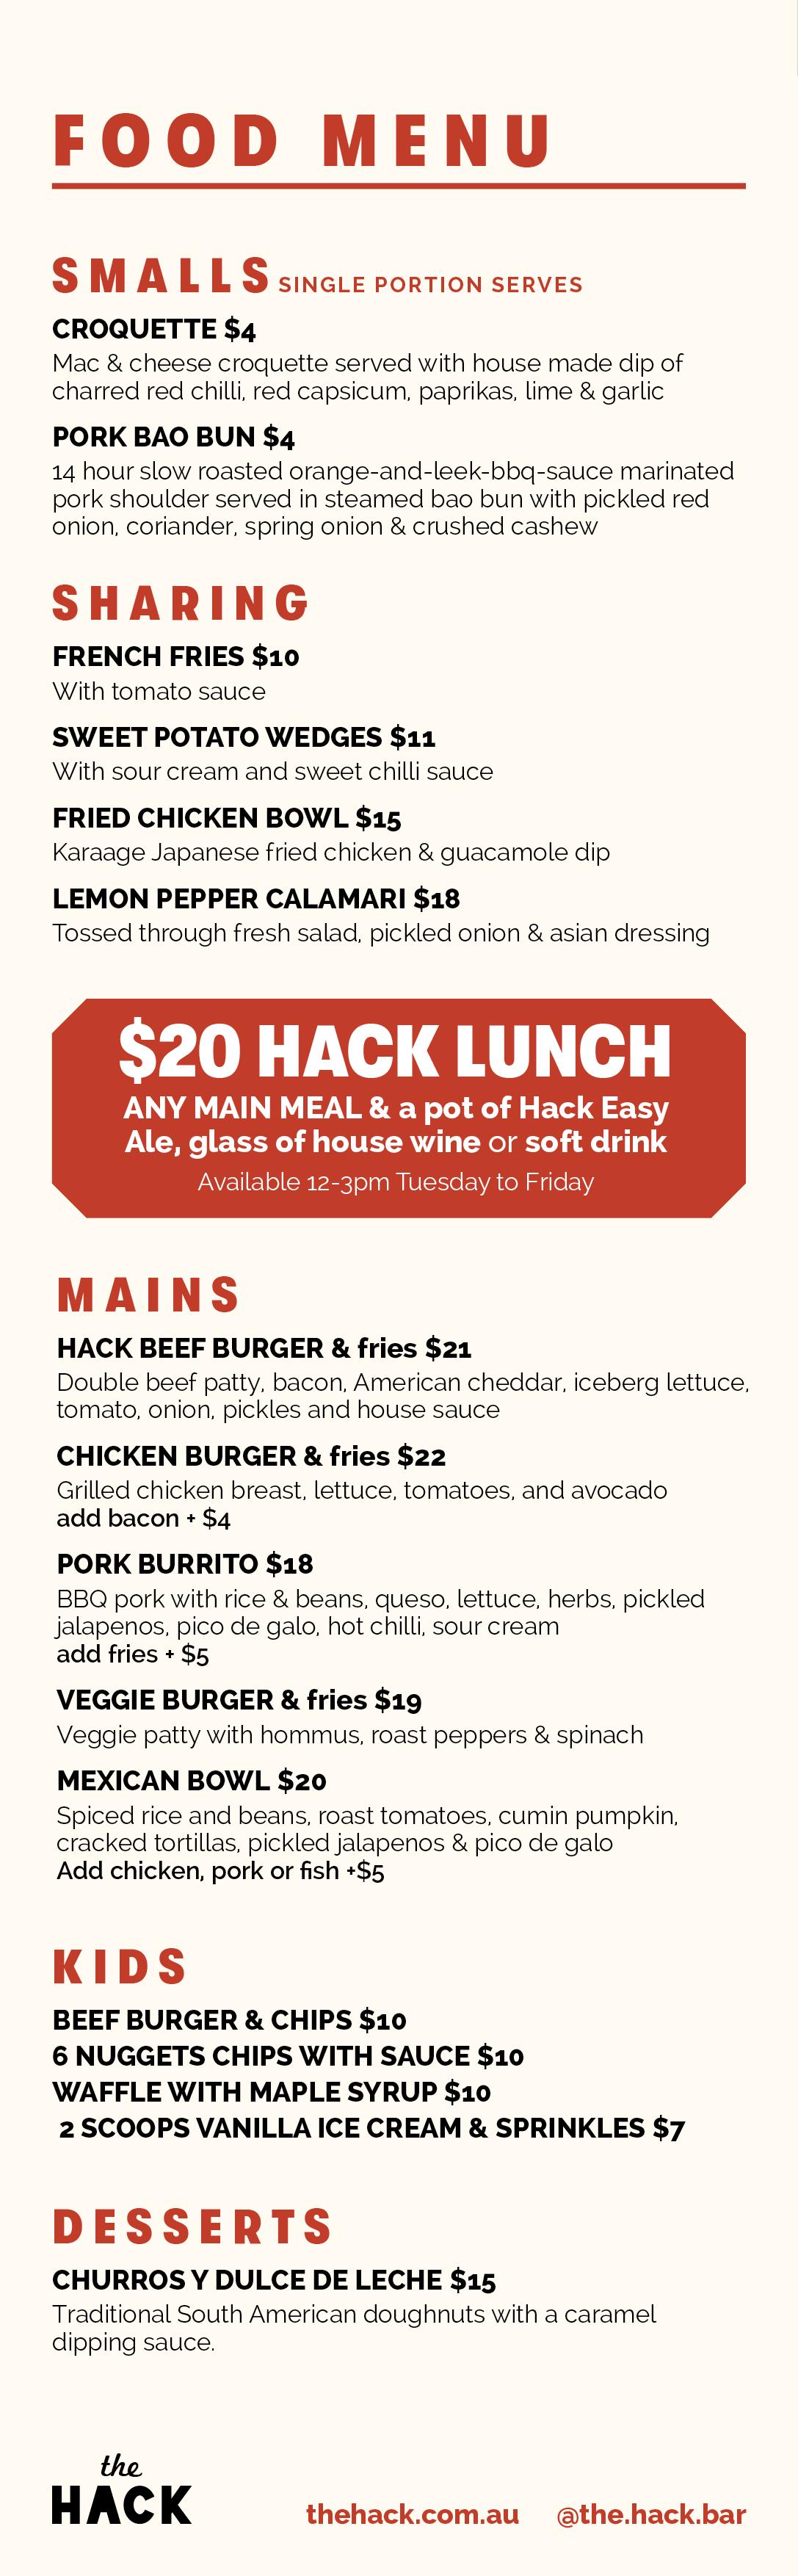 thehack_foodmenu_JUNE2019_WEB.png